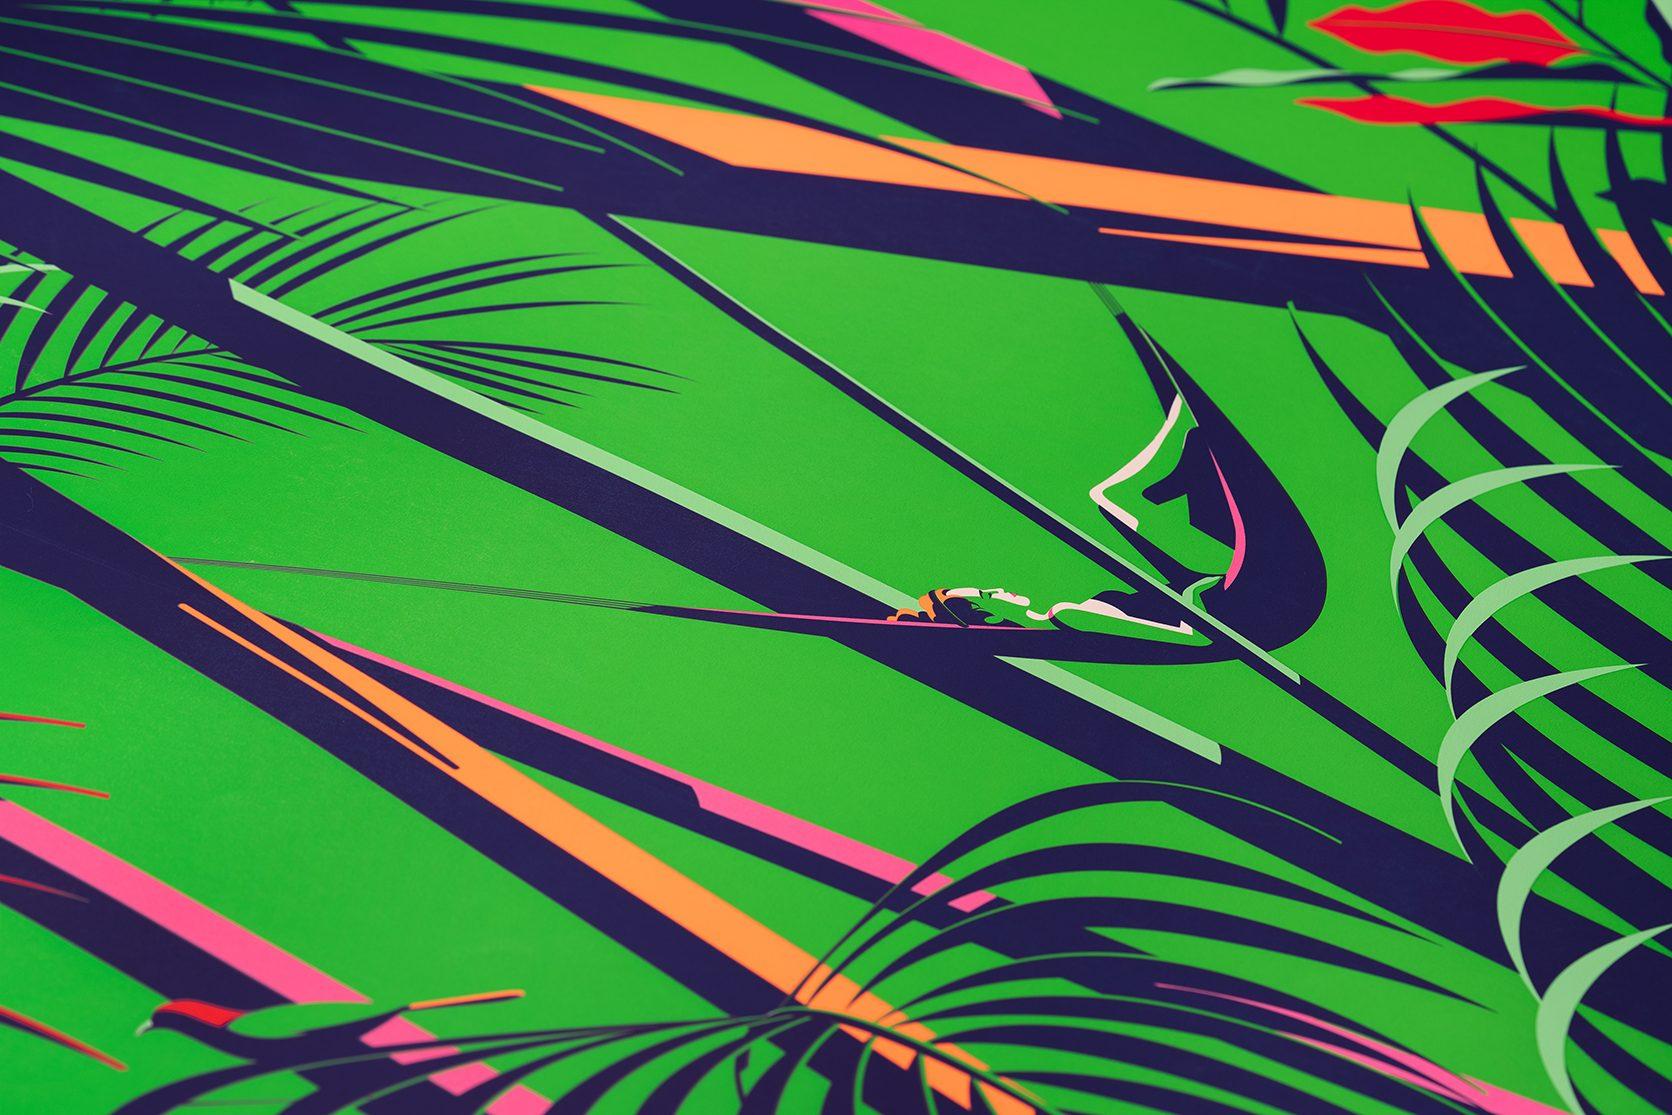 The Spirit of Playa Del Carmen, Mexico – Design by Futura Studio 03